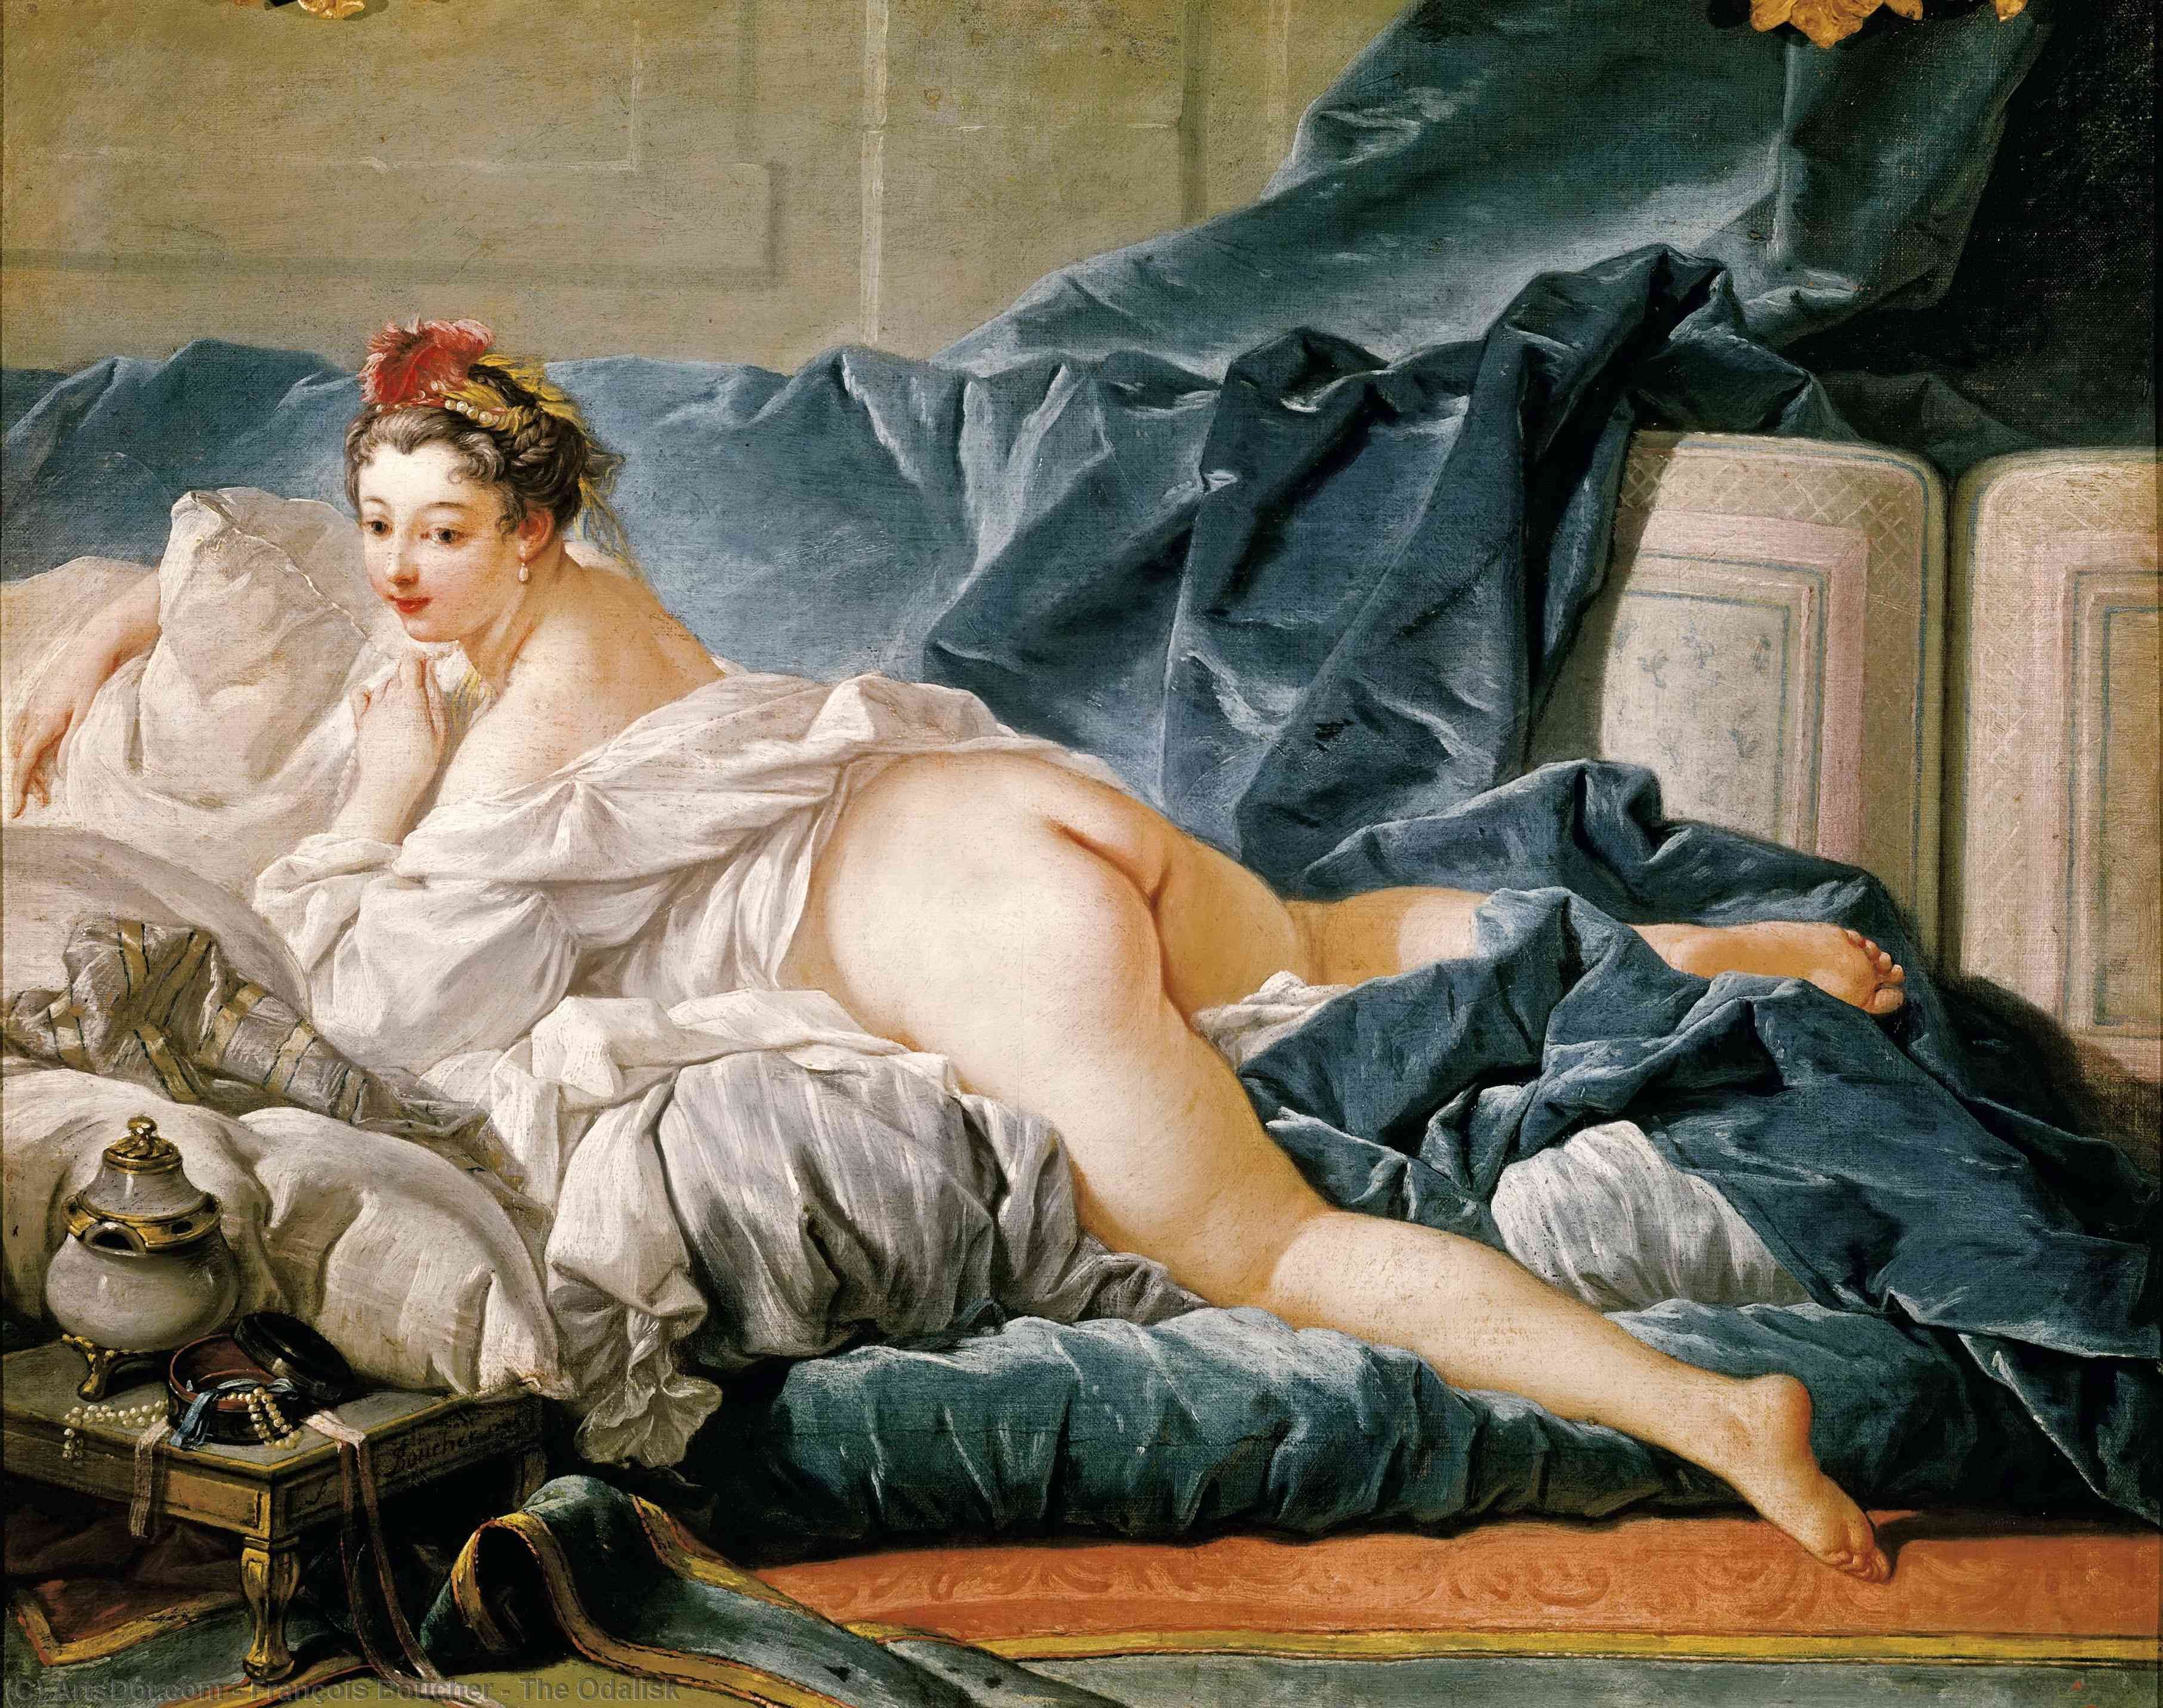 el odalisk, 1753 de François Boucher (1703-1770, France) | Grabados De Calidad Del Museo François Boucher | ArtsDot.com